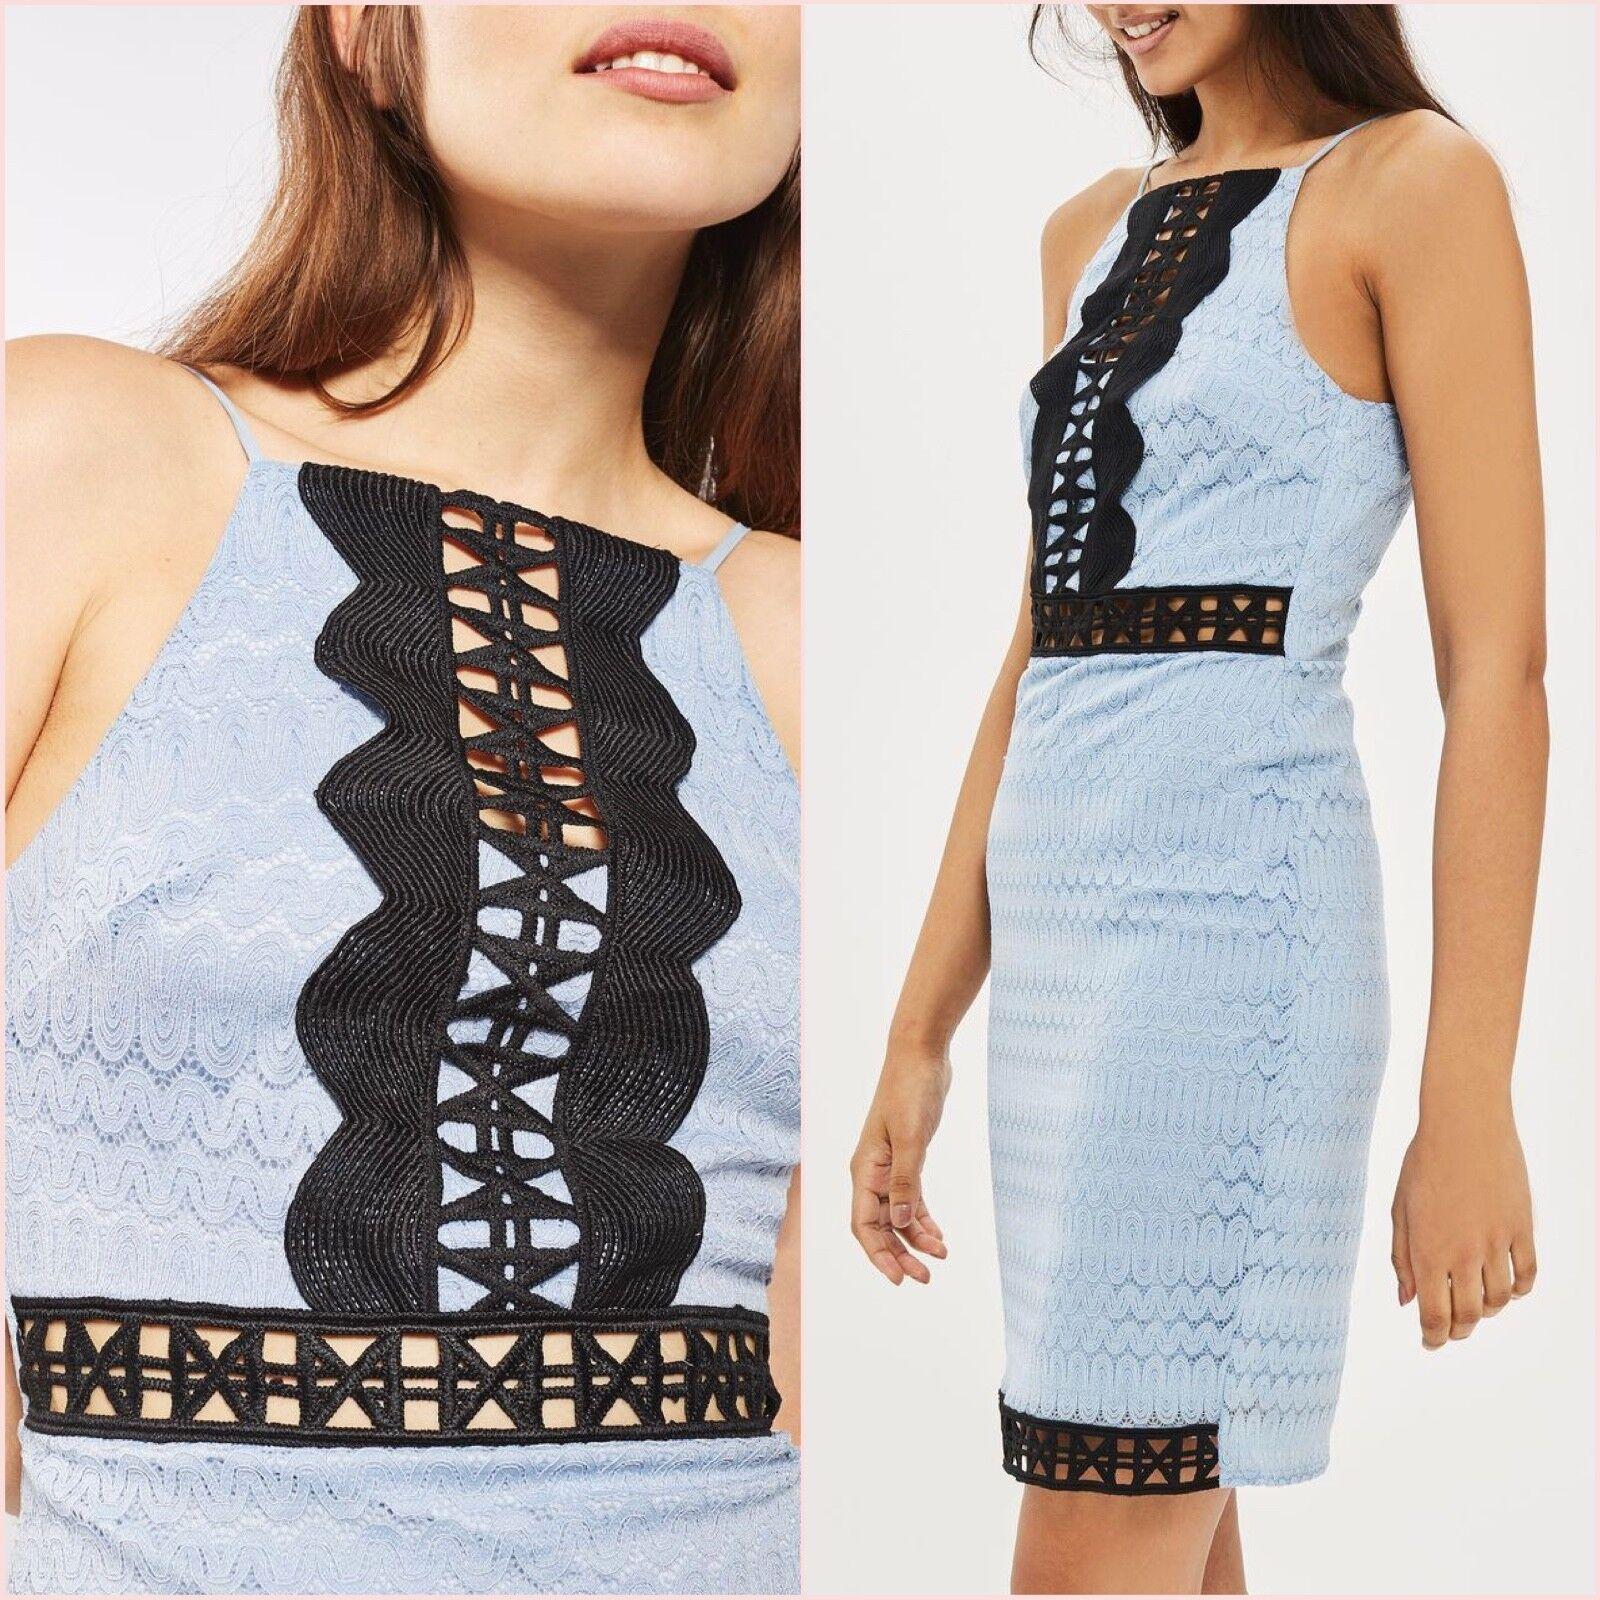 Topshop Petite bluee Crochet Lace Bodycon Mini Dress Size 8 14 US 2 10 Blogger